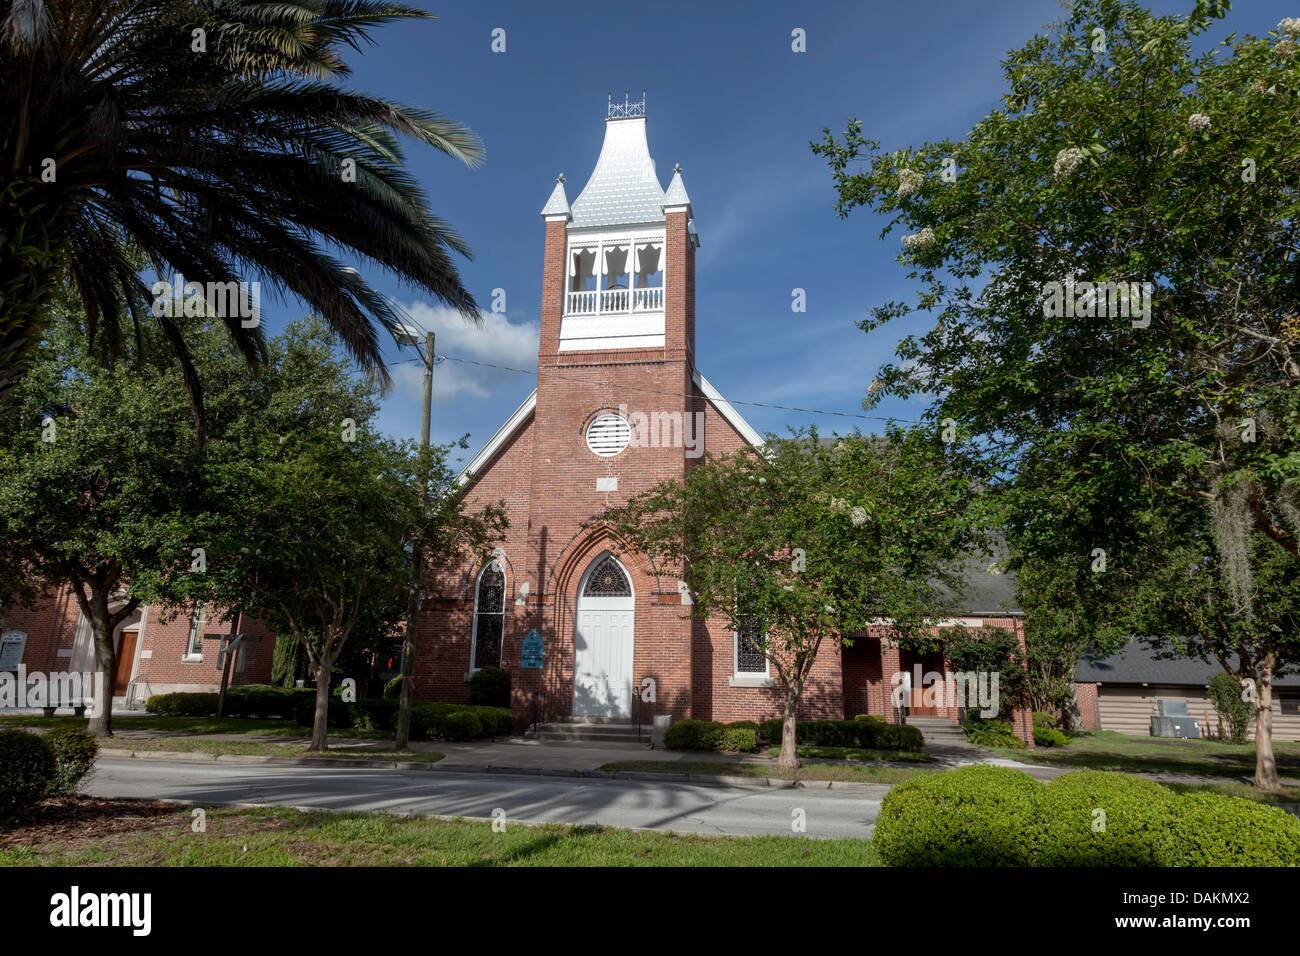 Fachada de ladrillo rojo principal de la histórica Iglesia Metodista Unida Fellowship Hall en Gainesville, Imagen De Stock